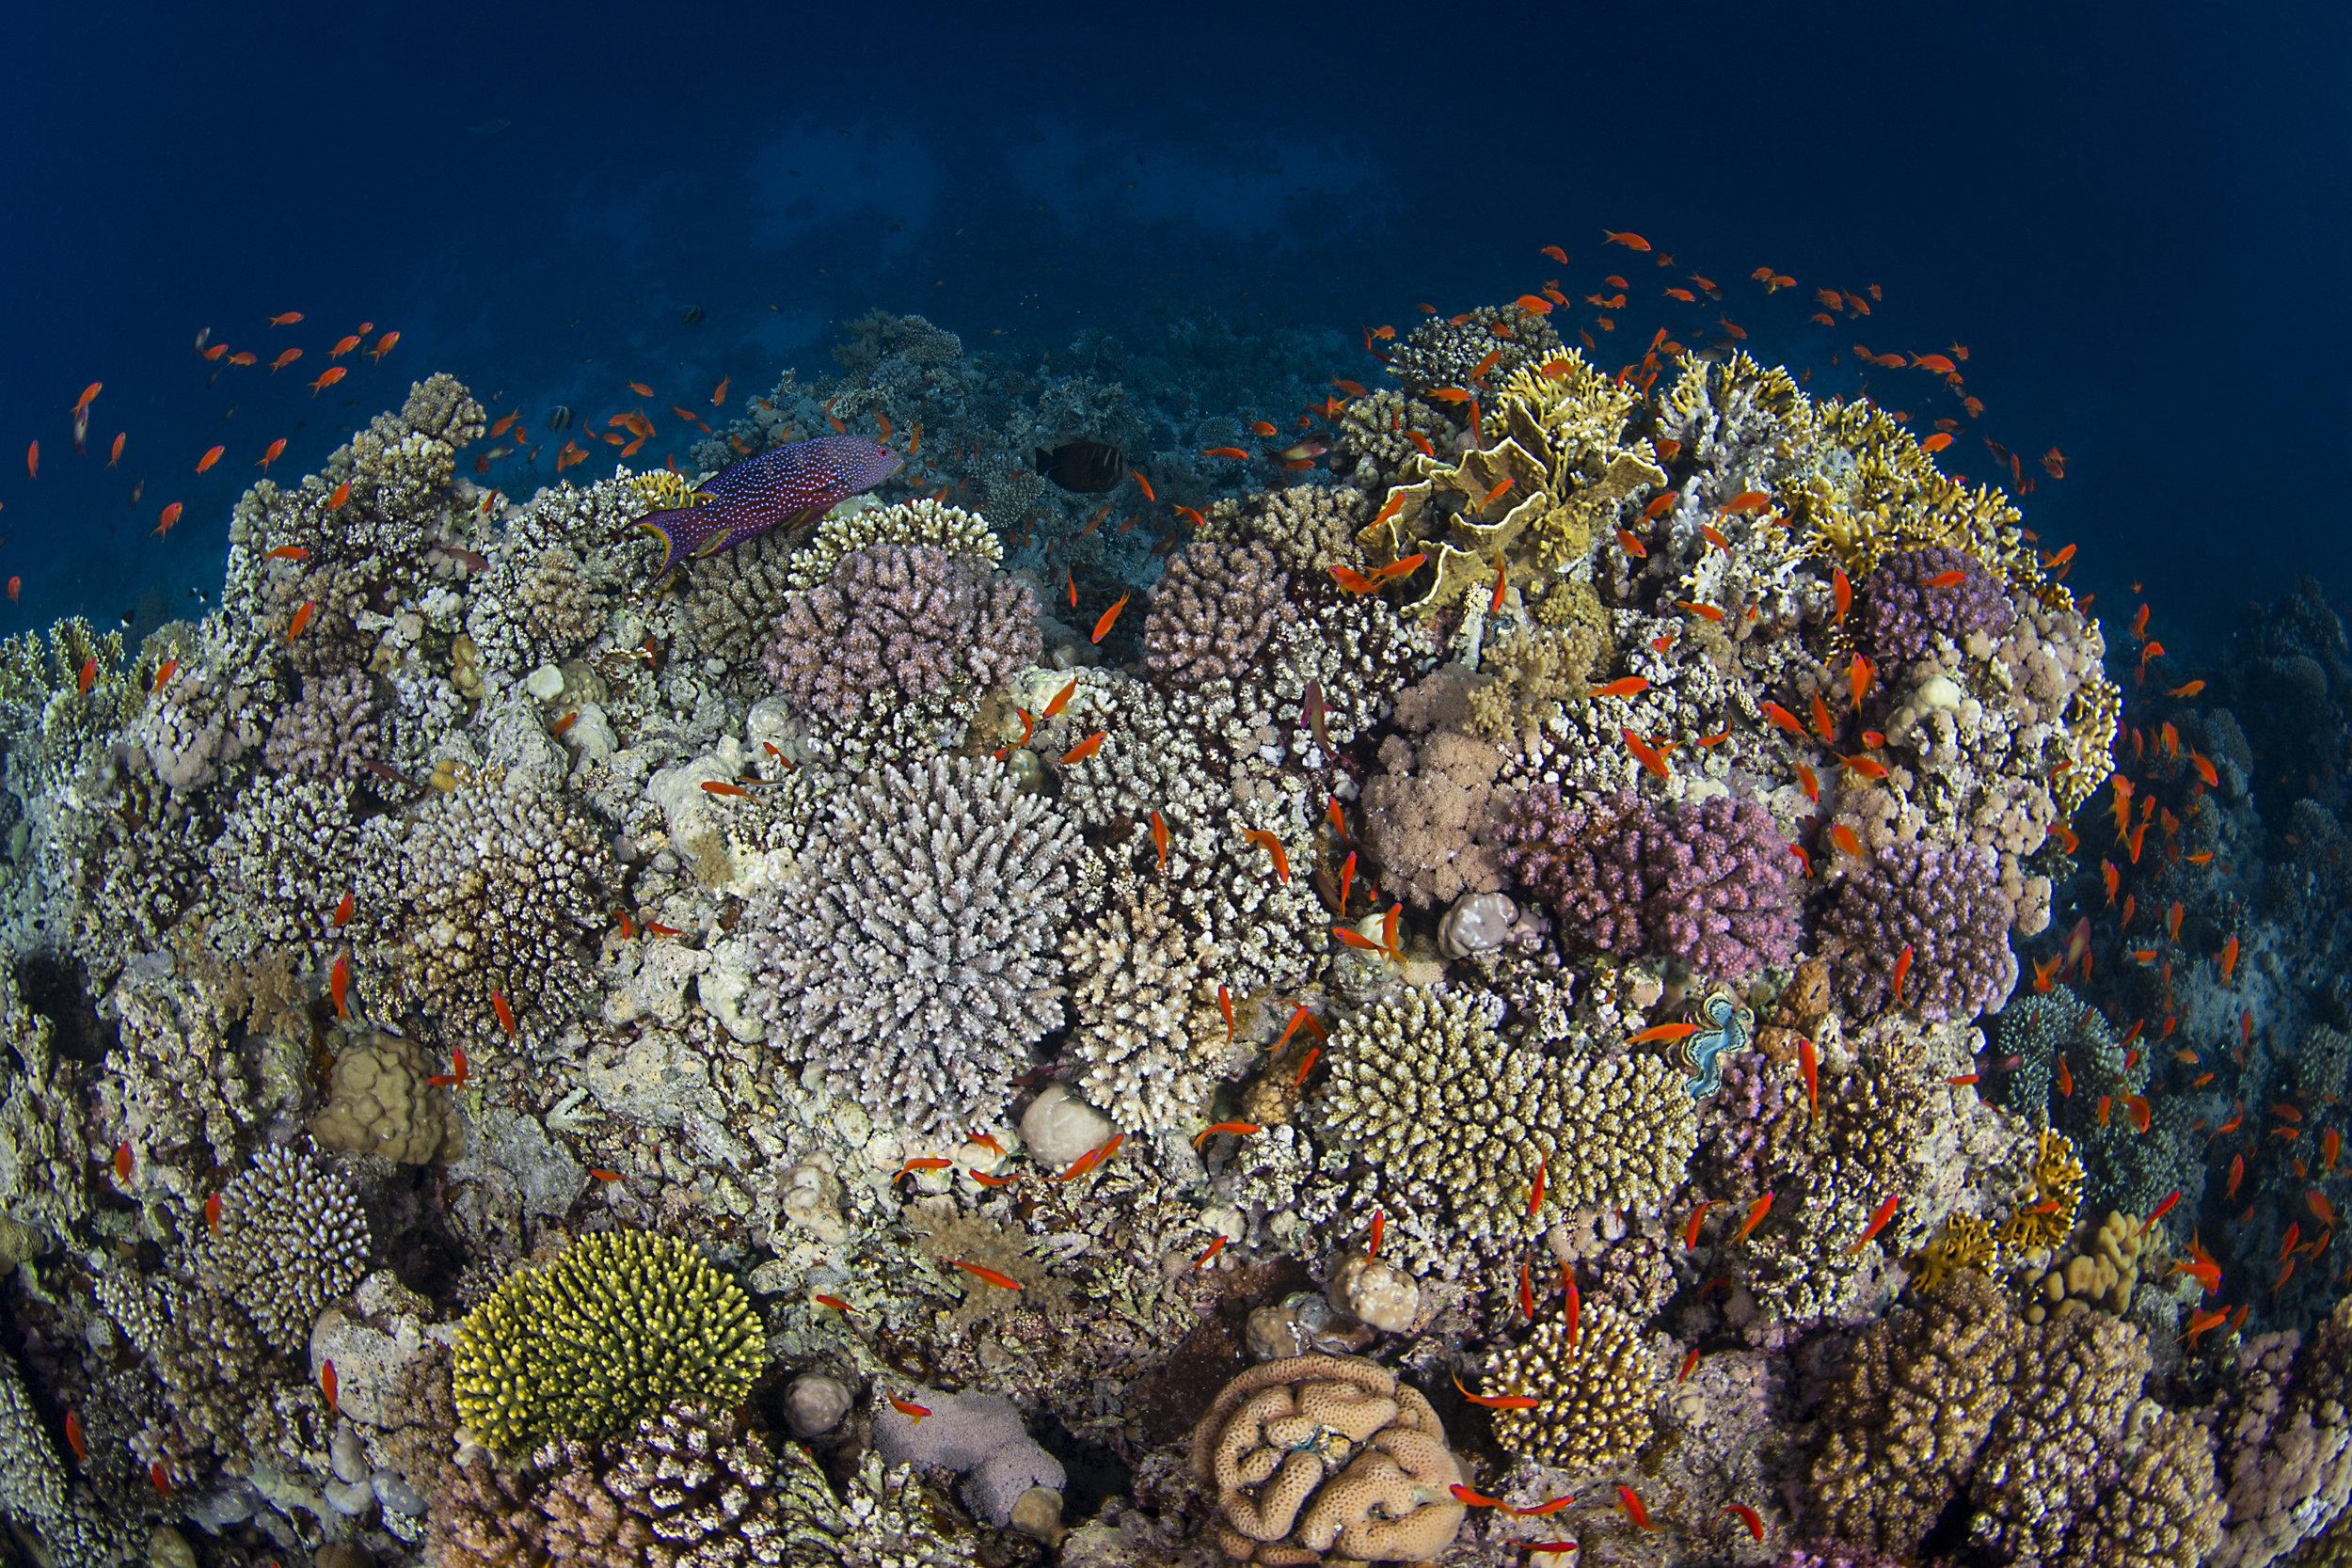 12 - fish swim over WOODHOUSE REEF, TIRAN ISLAND credit: renata romeo / coral reef image bank